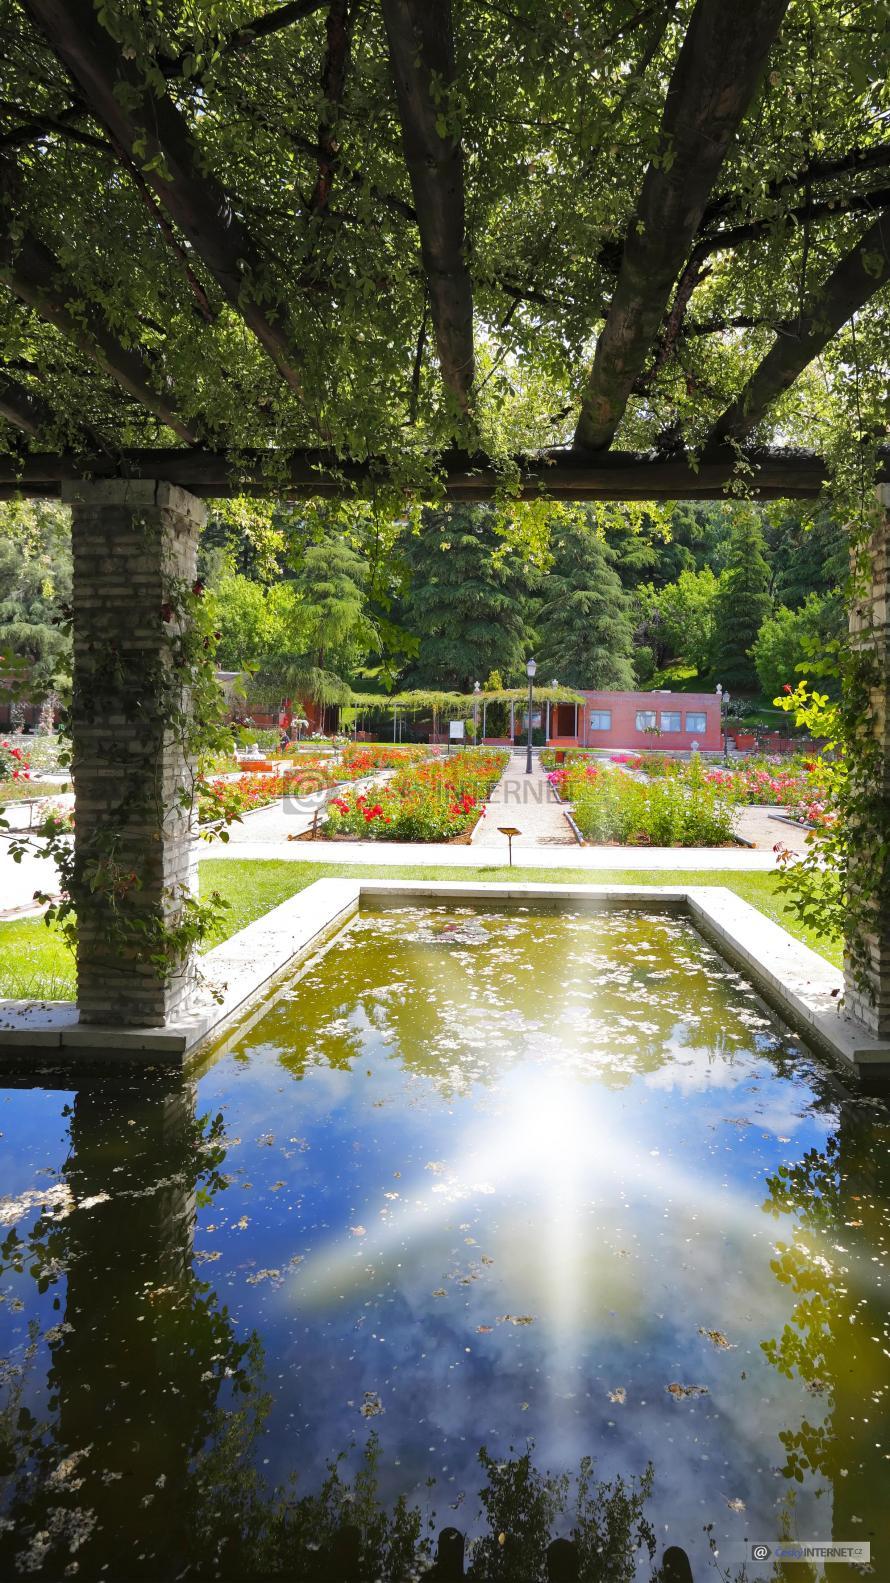 Okrasná zahrada s jezírkem.